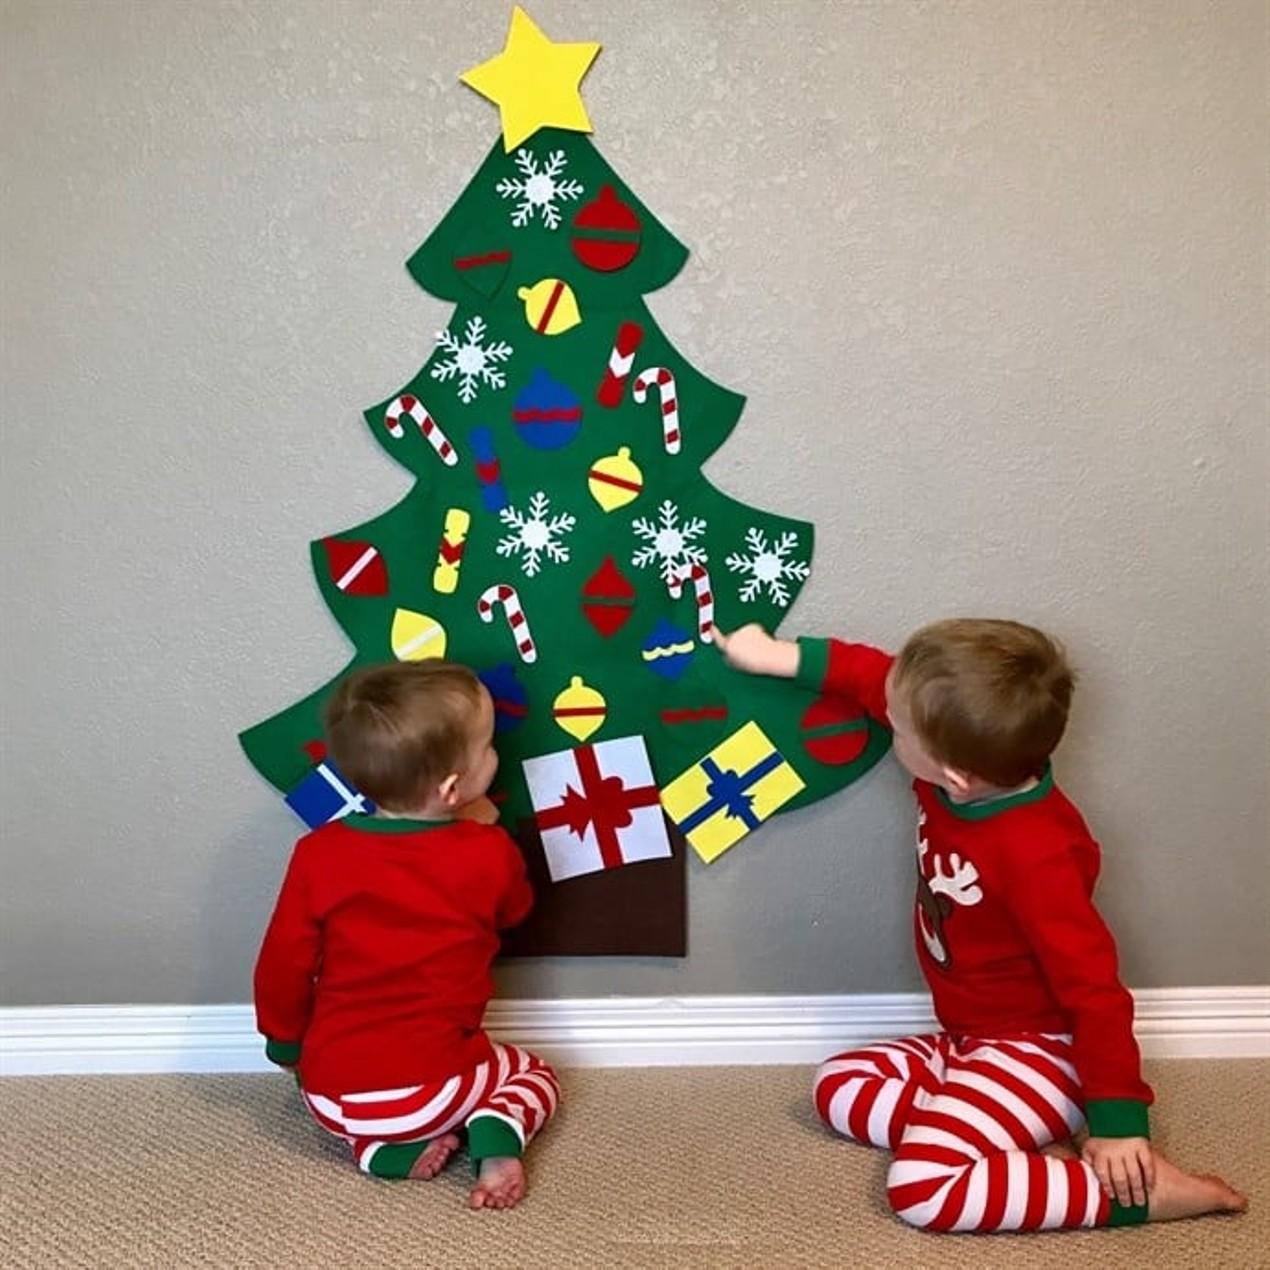 Kids Decorative DIY Felt Christmas Tree - Tanga